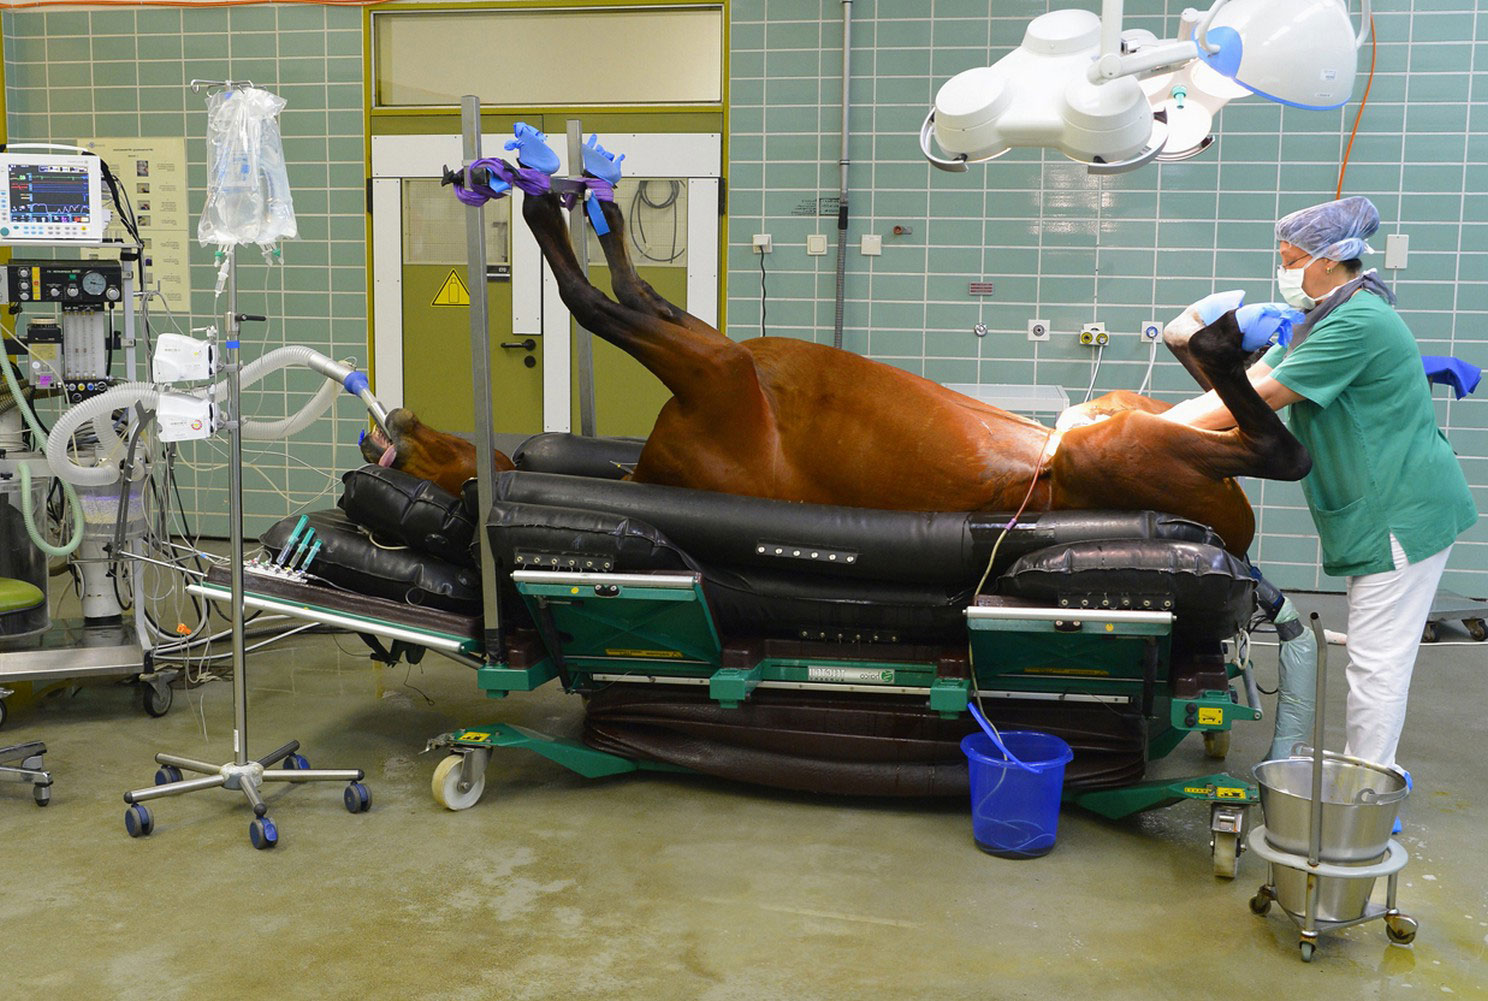 кастрация лошади